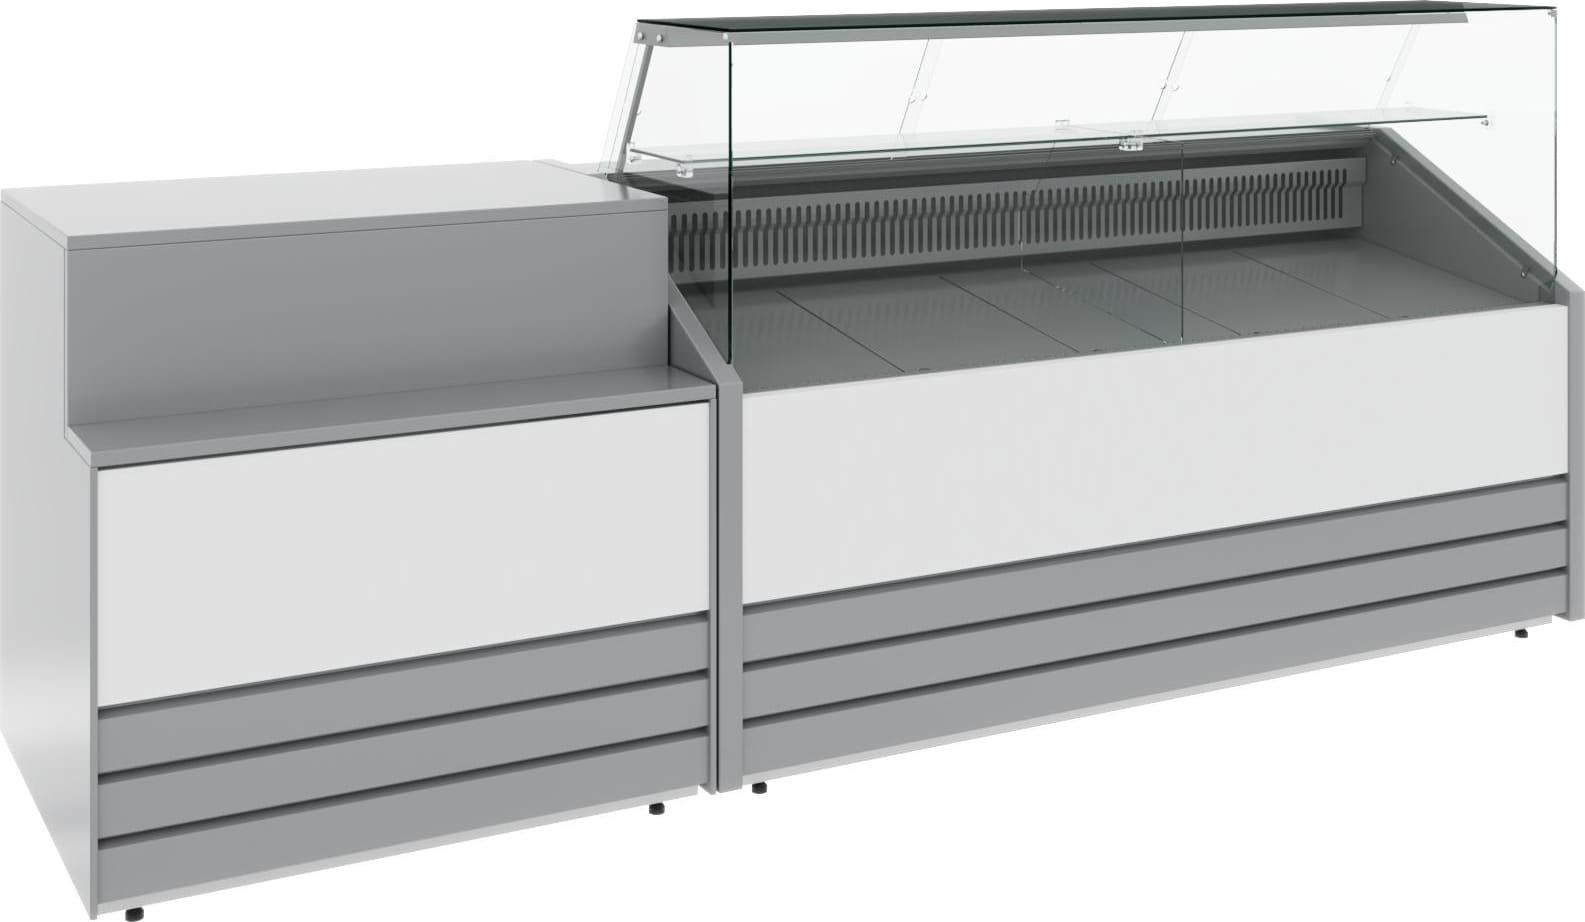 Холодильная витрина CARBOMA COLORE GС75 SV1.8-1 9006-9003 - 15